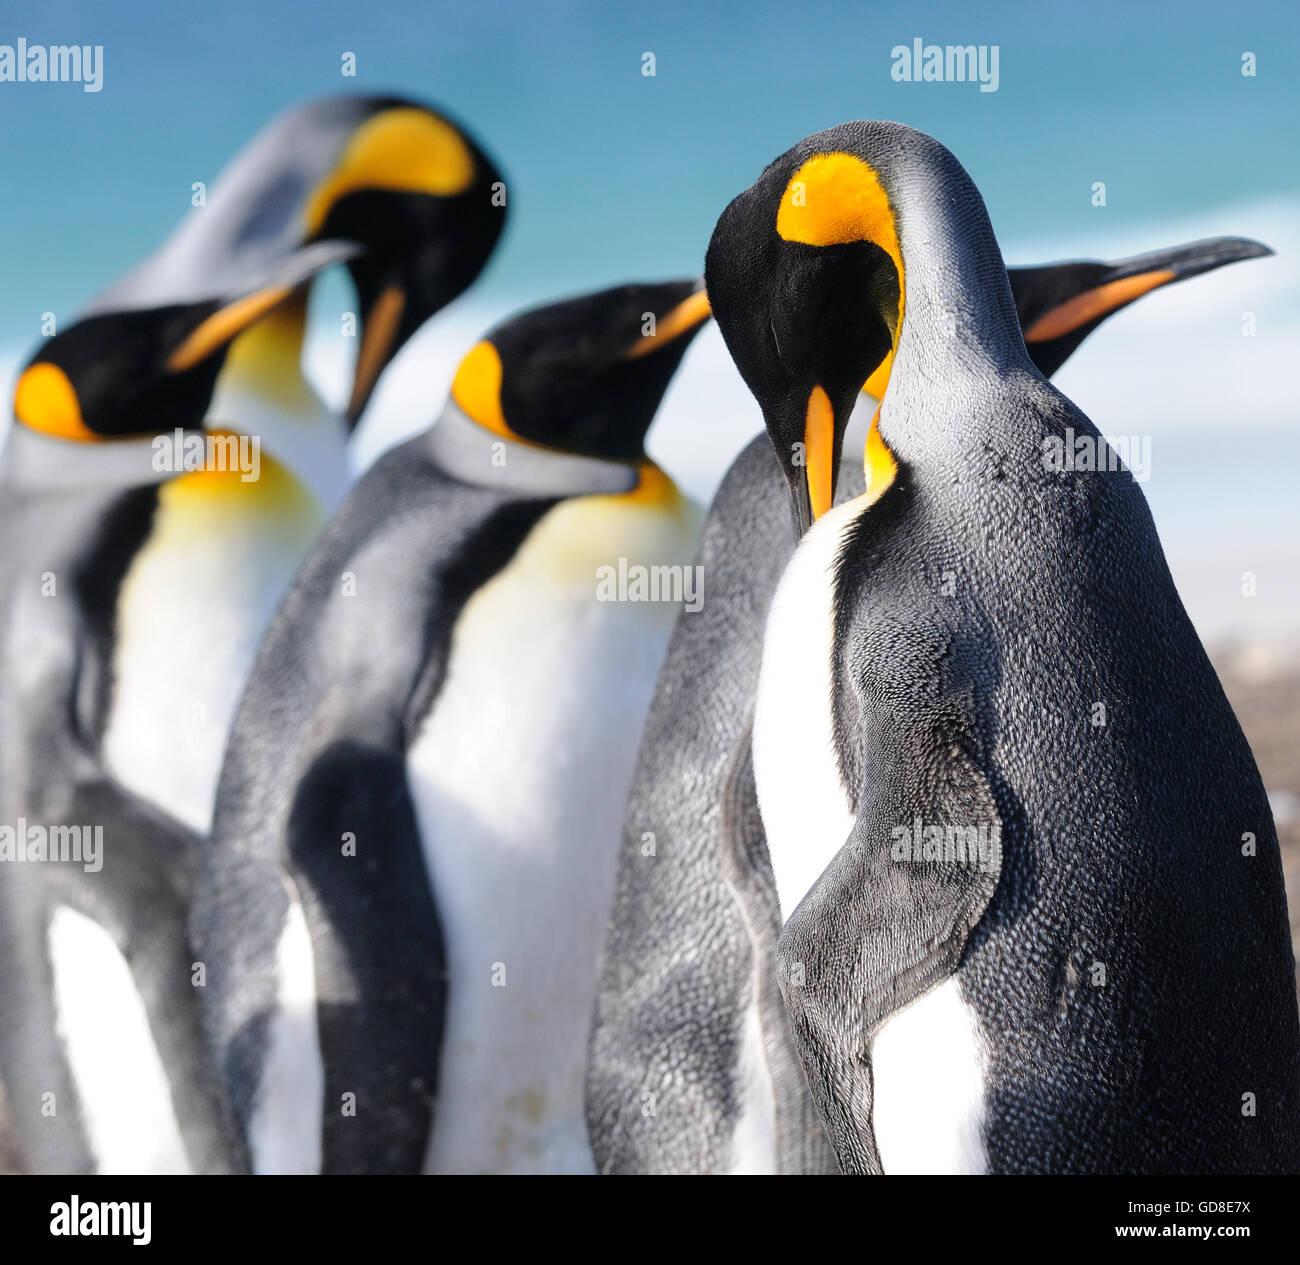 King penguins (Aptenodytes patagonicus).  Saunders Island, Falkland Islands. South Atlantic. - Stock Image